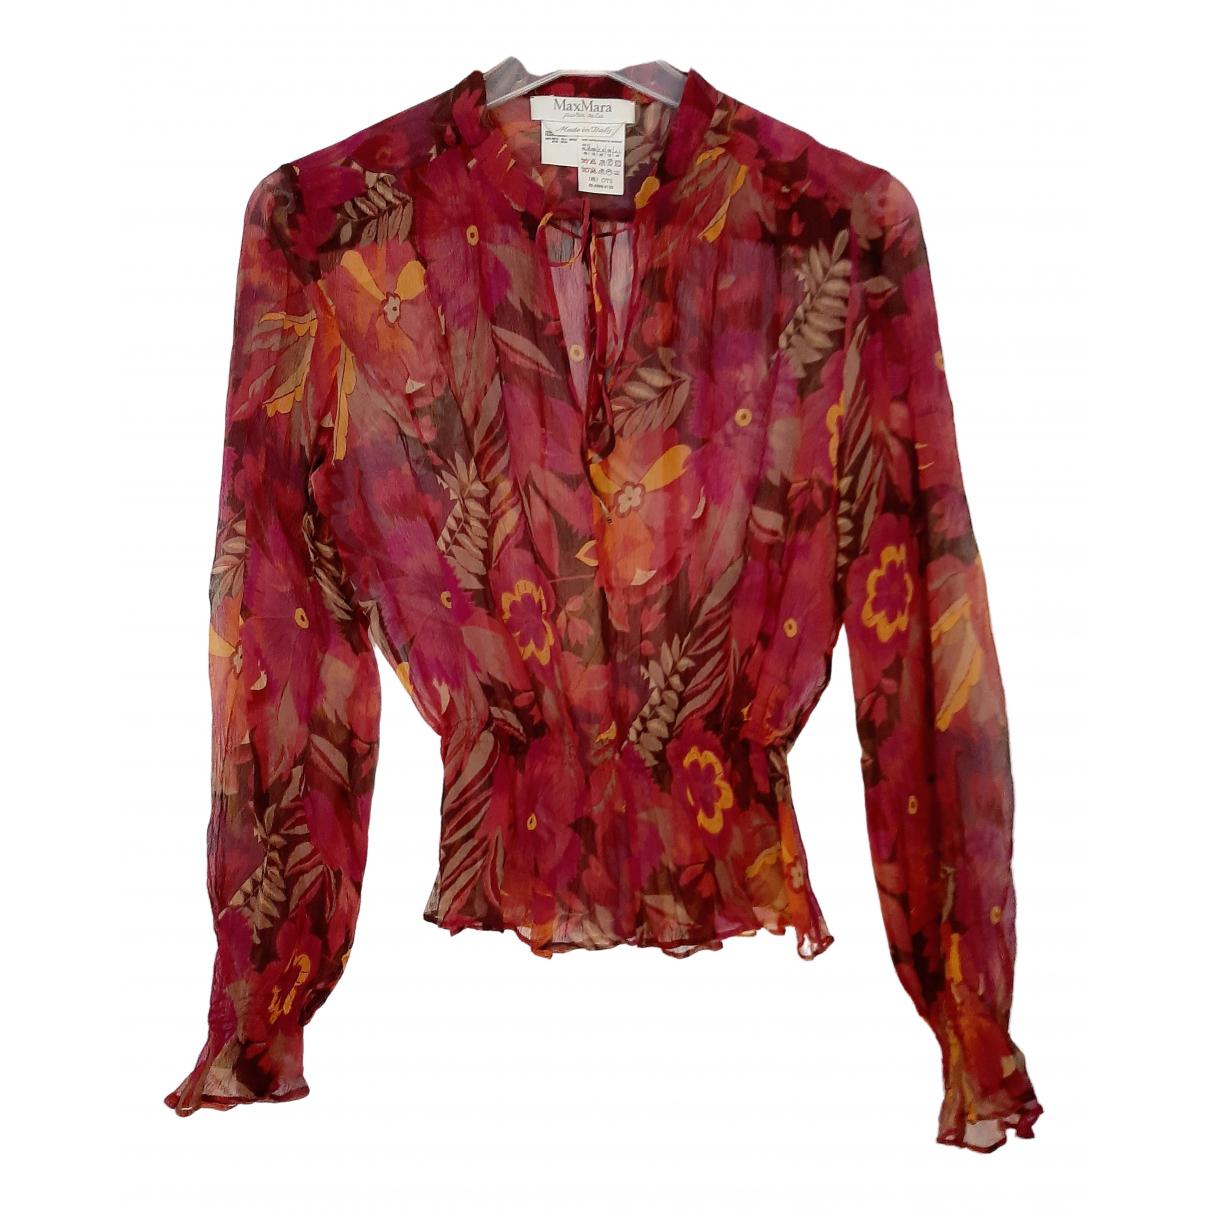 Max Mara N Multicolour Silk  top for Women 12 UK